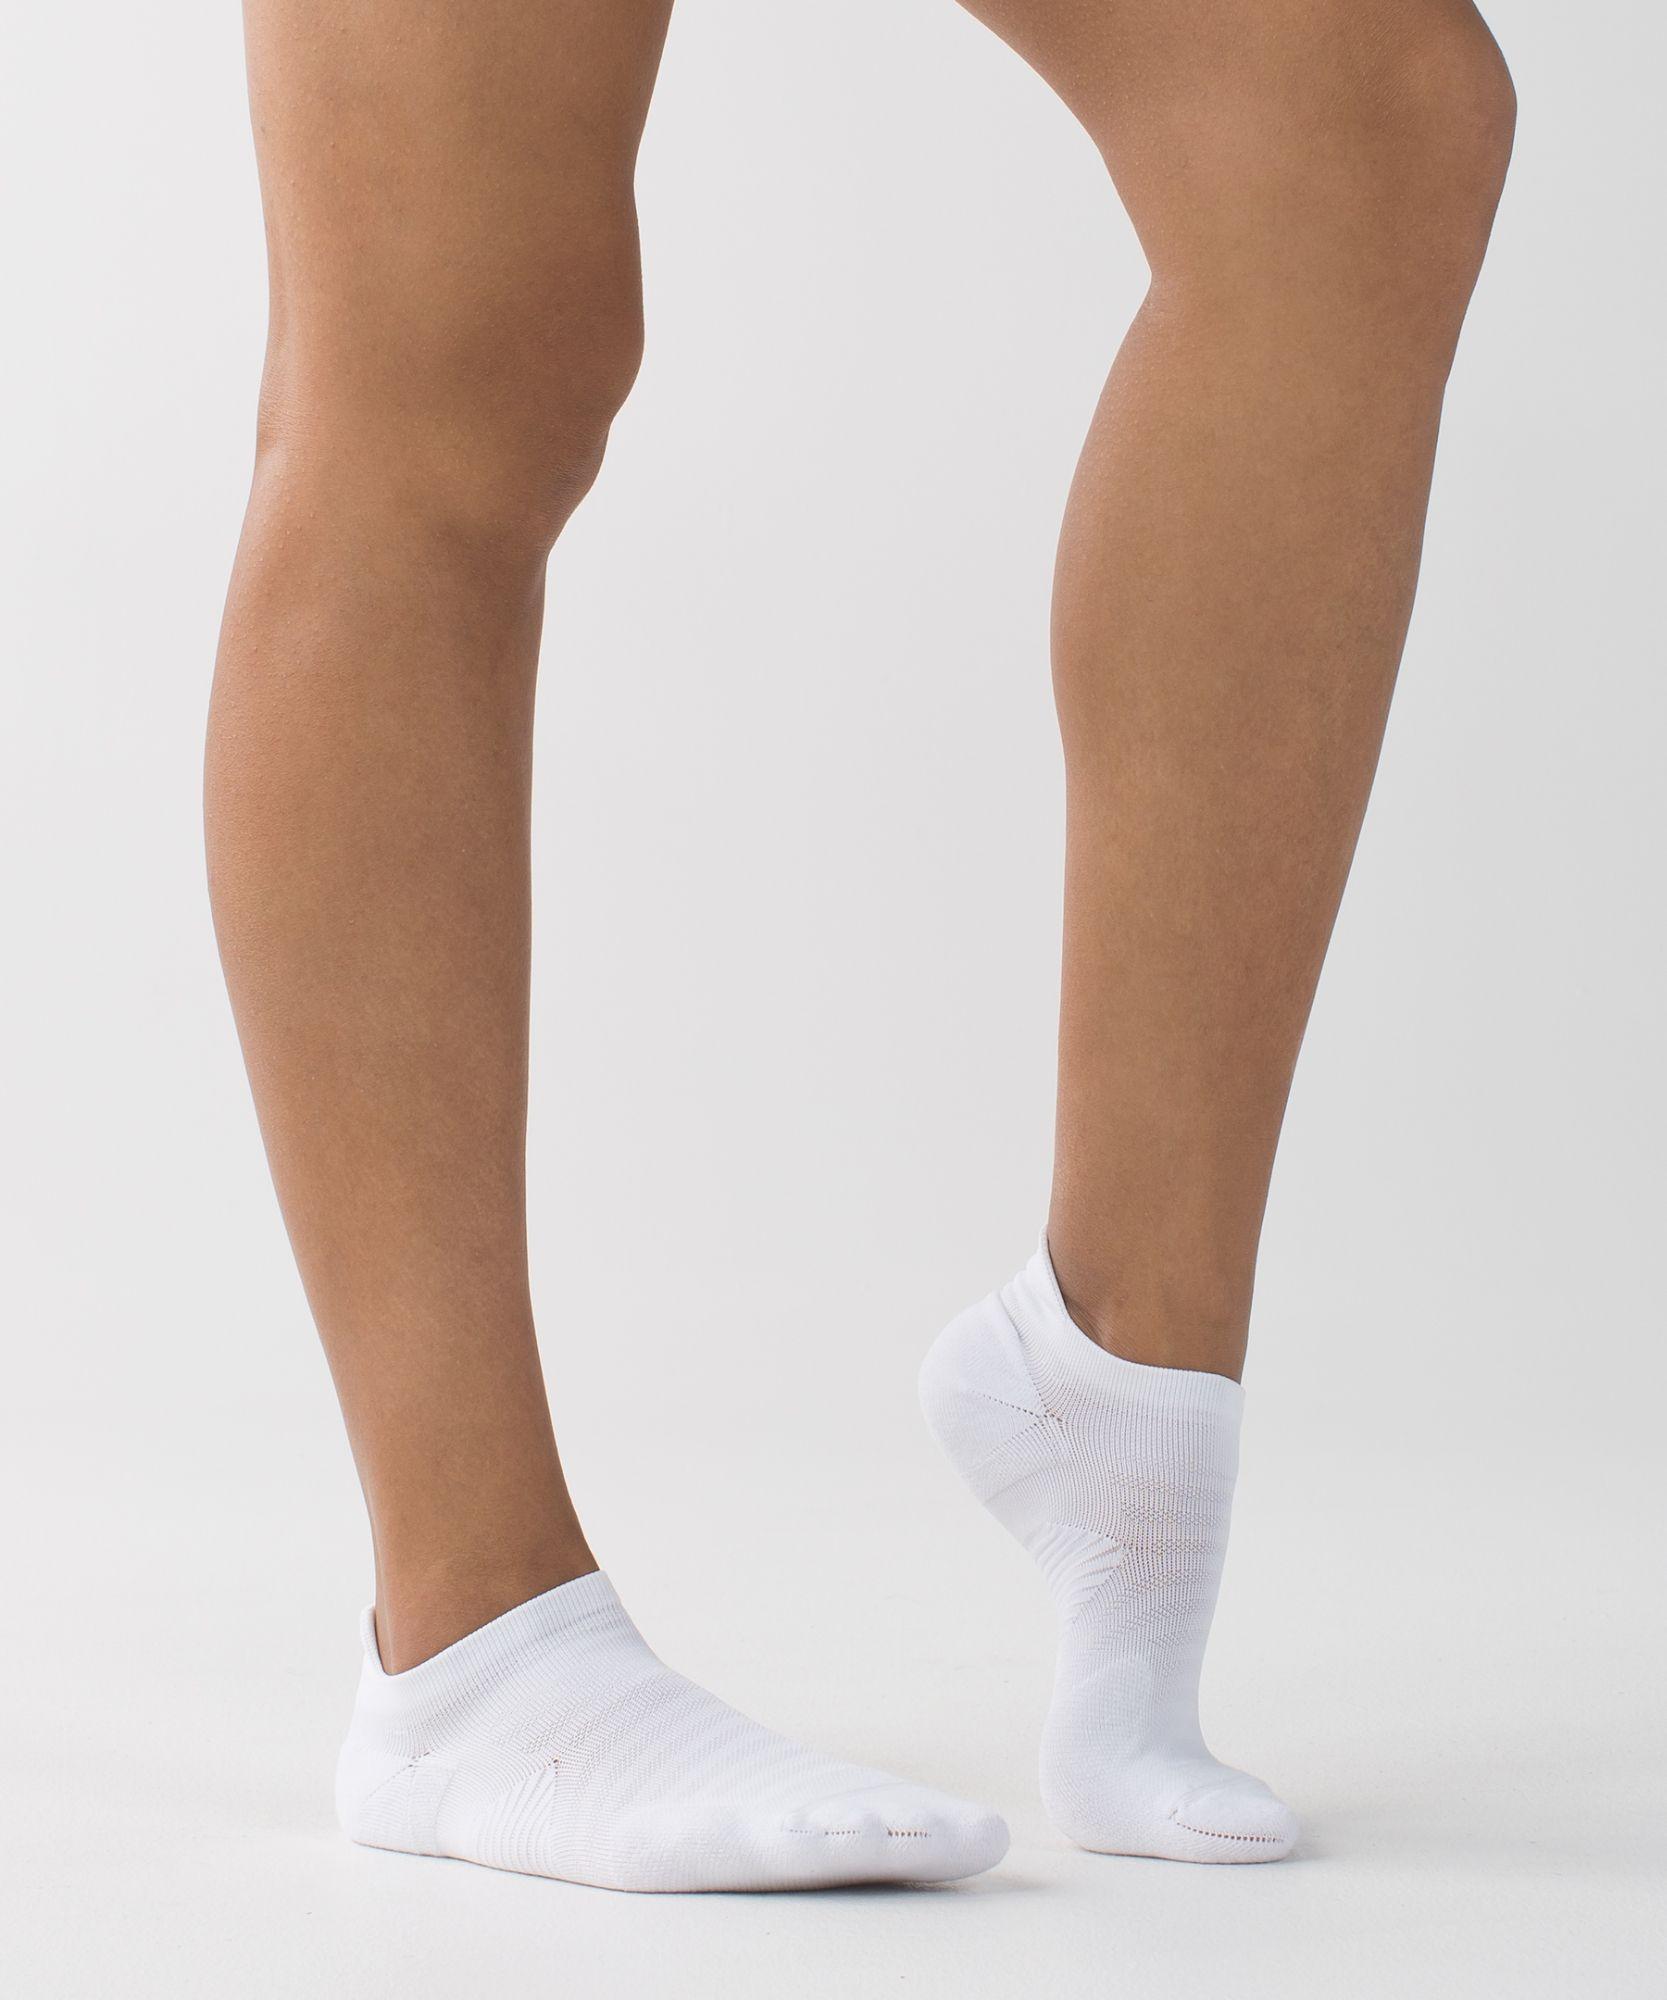 Women's Yoga Socks Speed Sock lululemon (With images